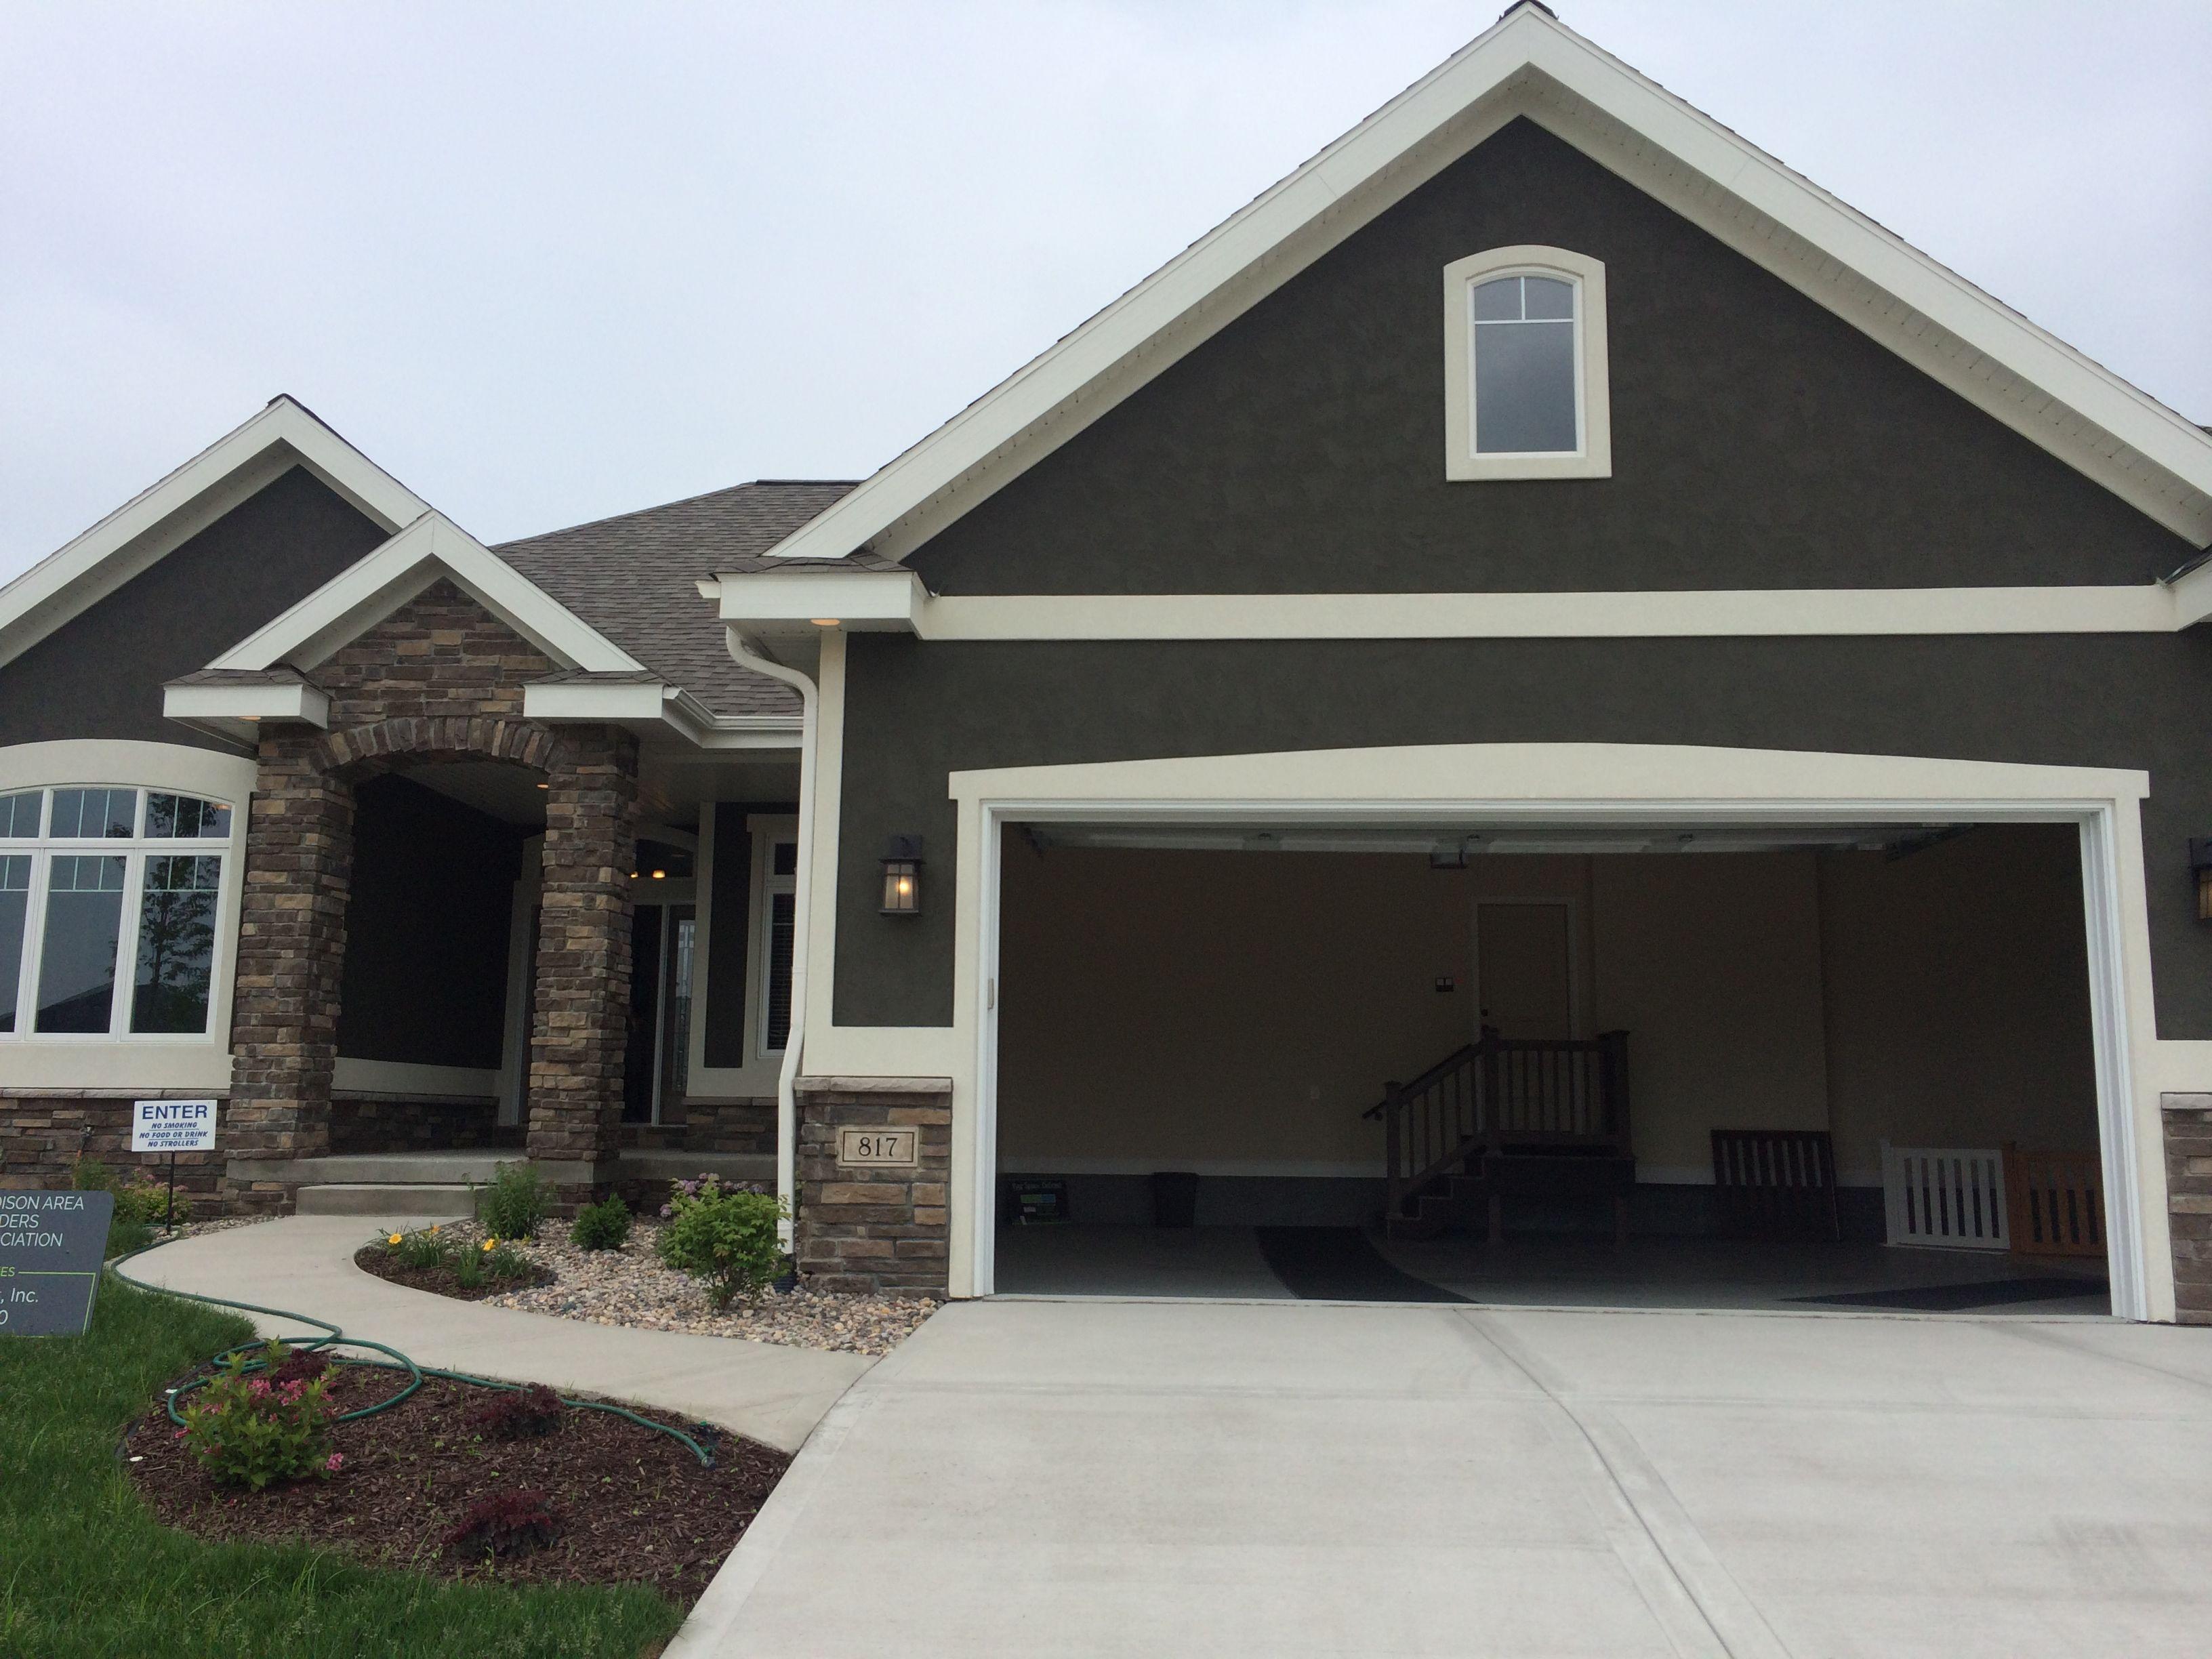 dark grey stucco exterior, white trim, nice stone entrance ...